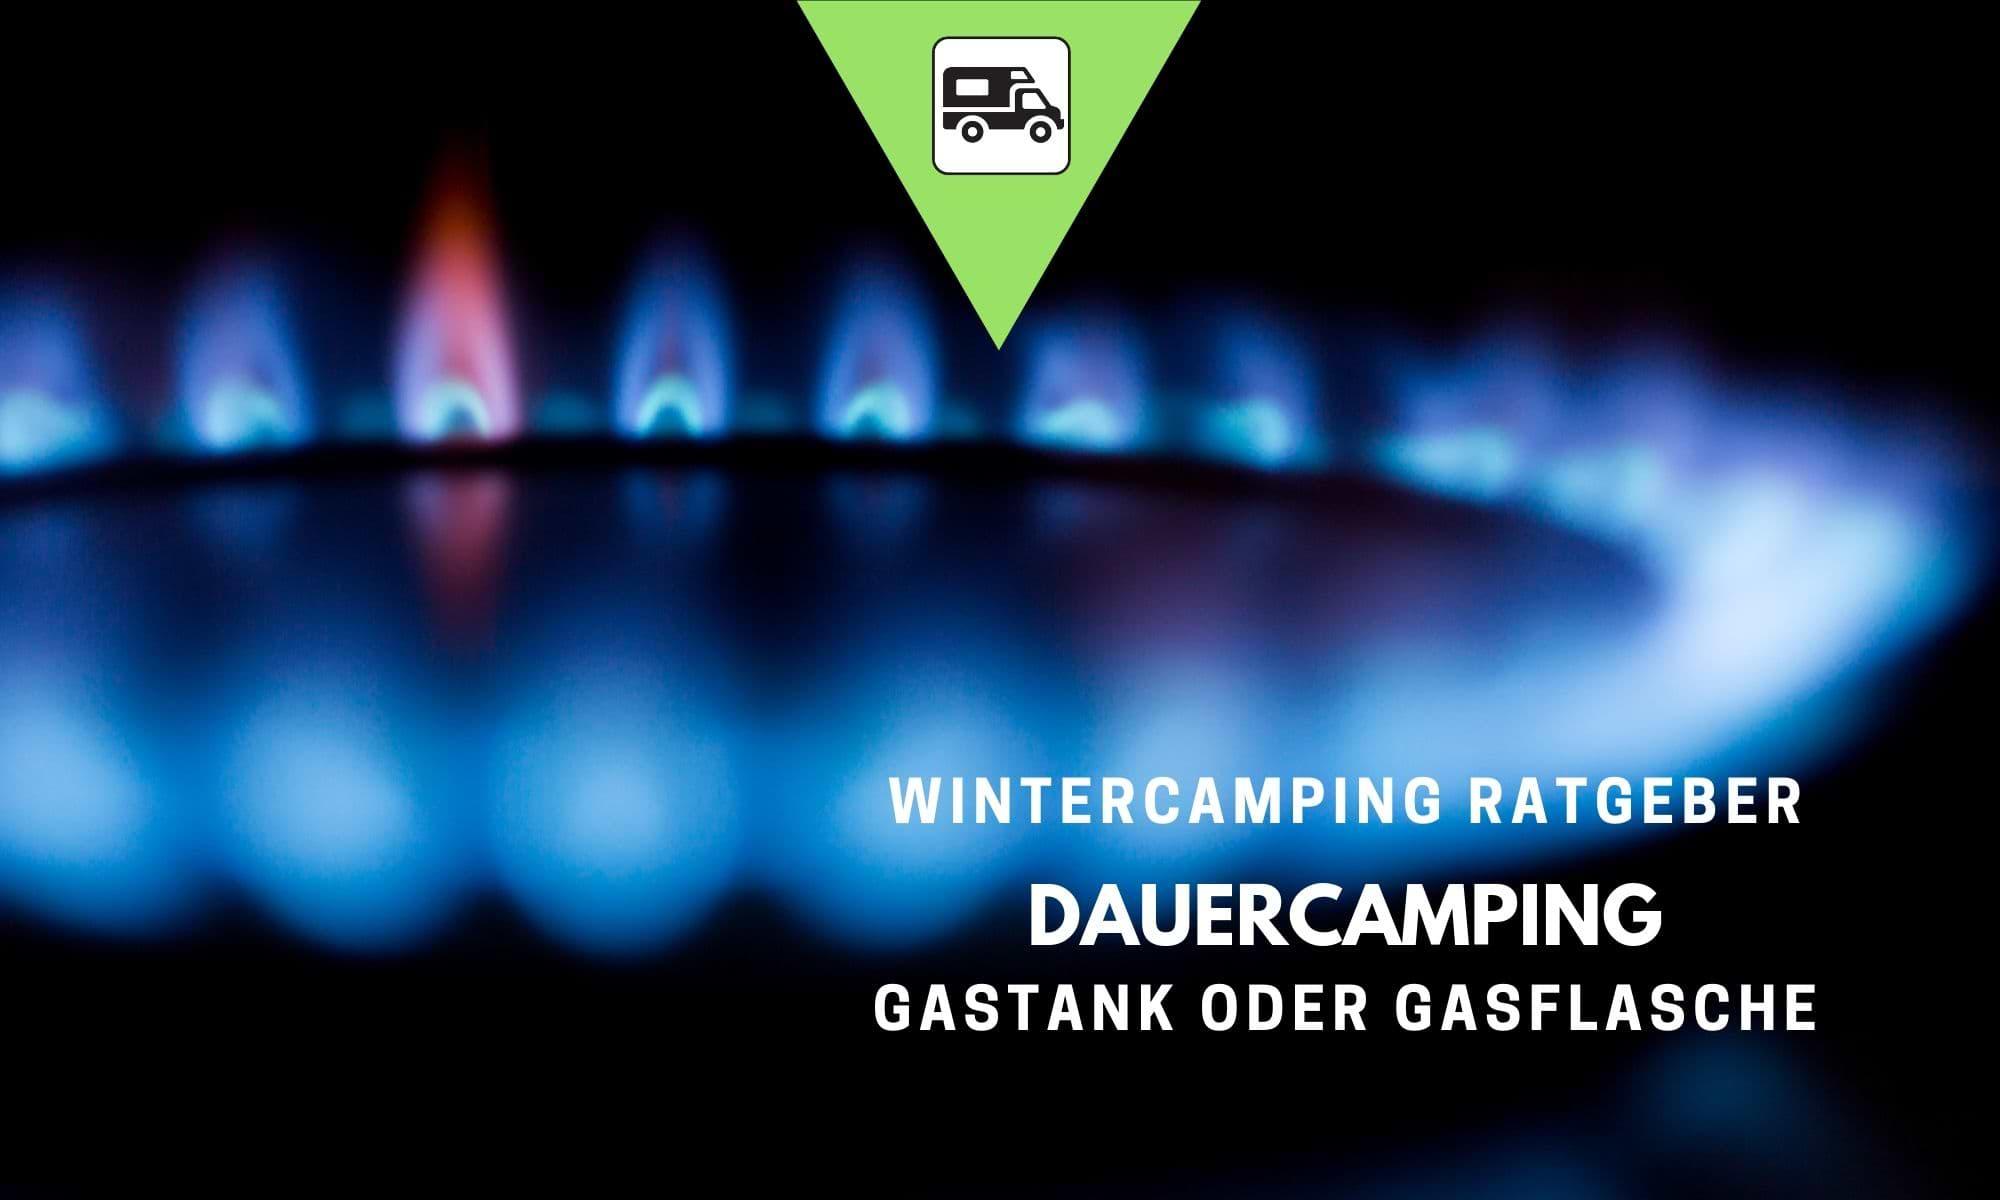 Wintercamping Ratgeber – Gastank beim Dauercamping